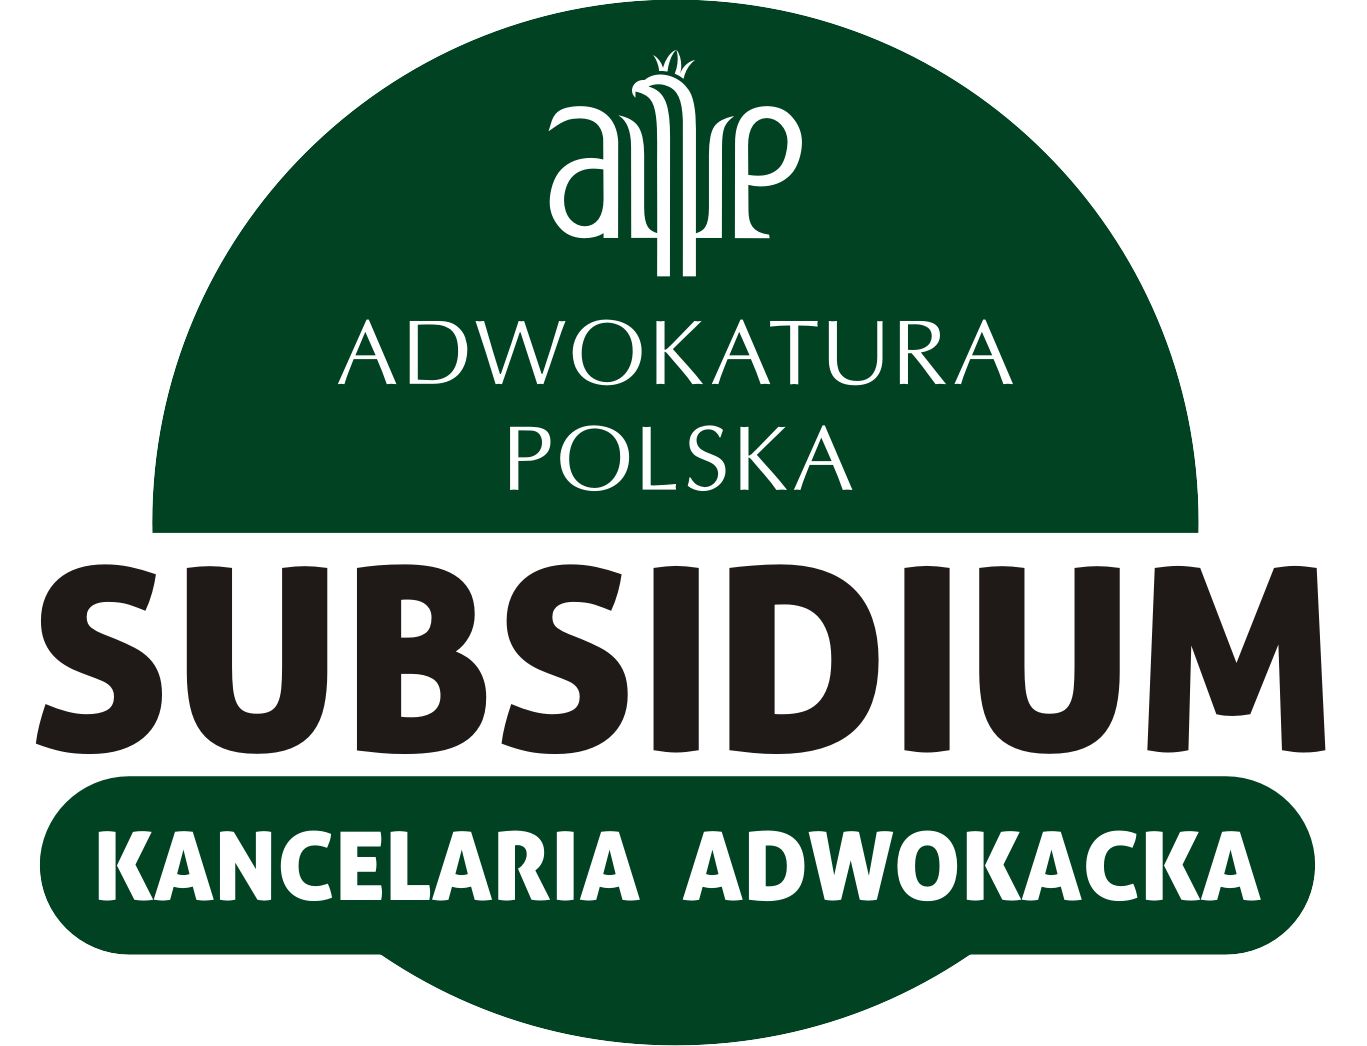 Subsidium Kancelaria Adwokacka